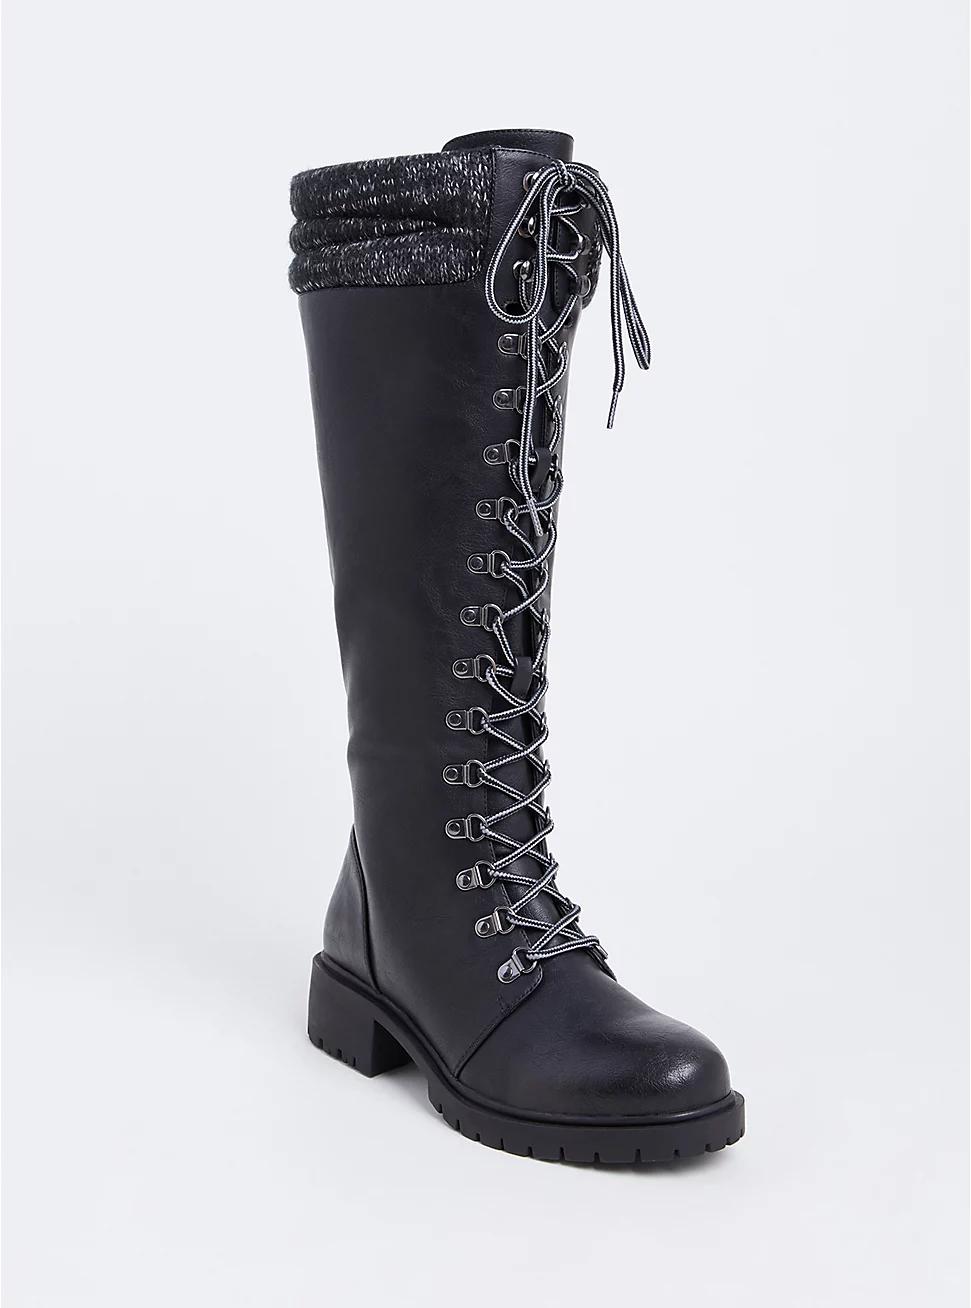 9 Tall Boots That Curvy Girls Will Love